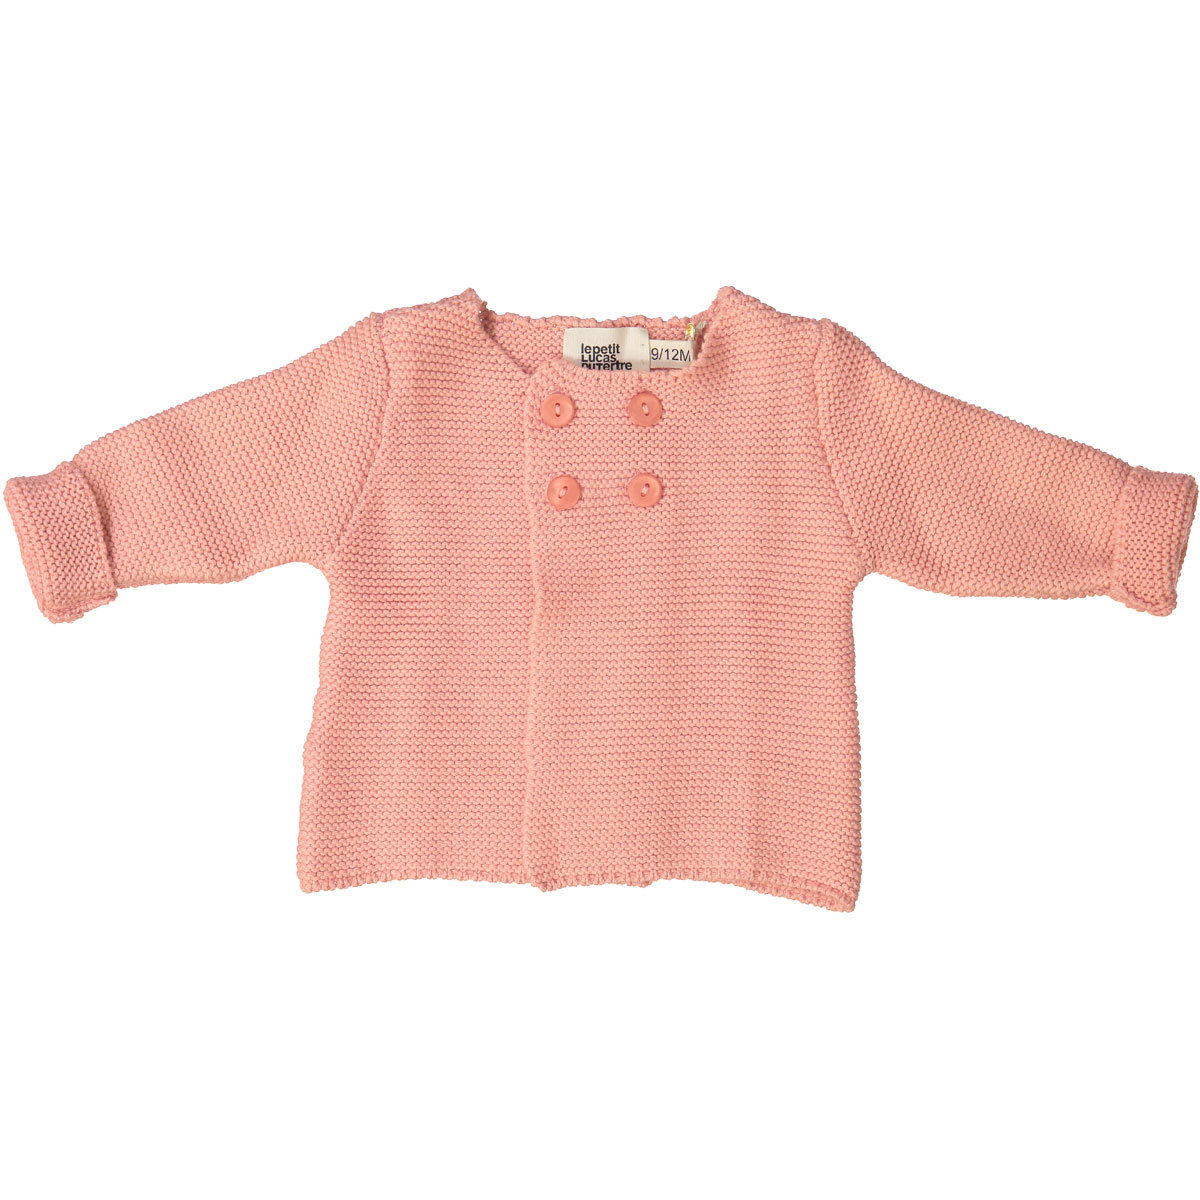 Hauts bébé Cardigan Julia - Rose - 3/6 Mois Cardigan Julia - Rose - 3/6 Mois